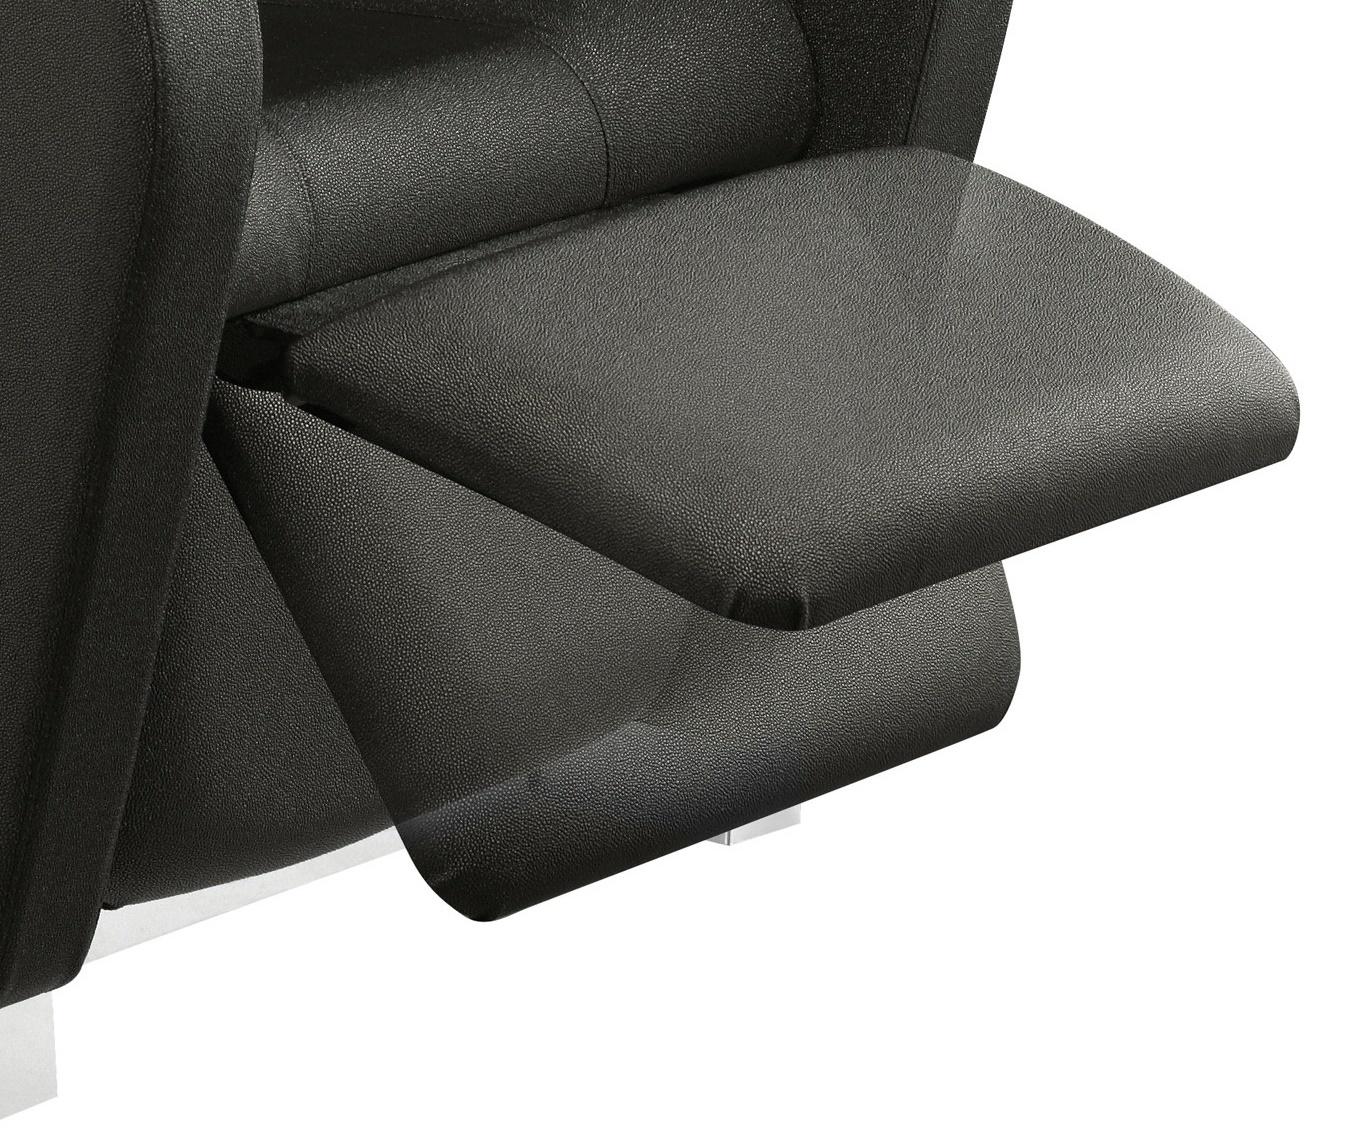 bac shampoing massant serenity jacques seban sere js. Black Bedroom Furniture Sets. Home Design Ideas